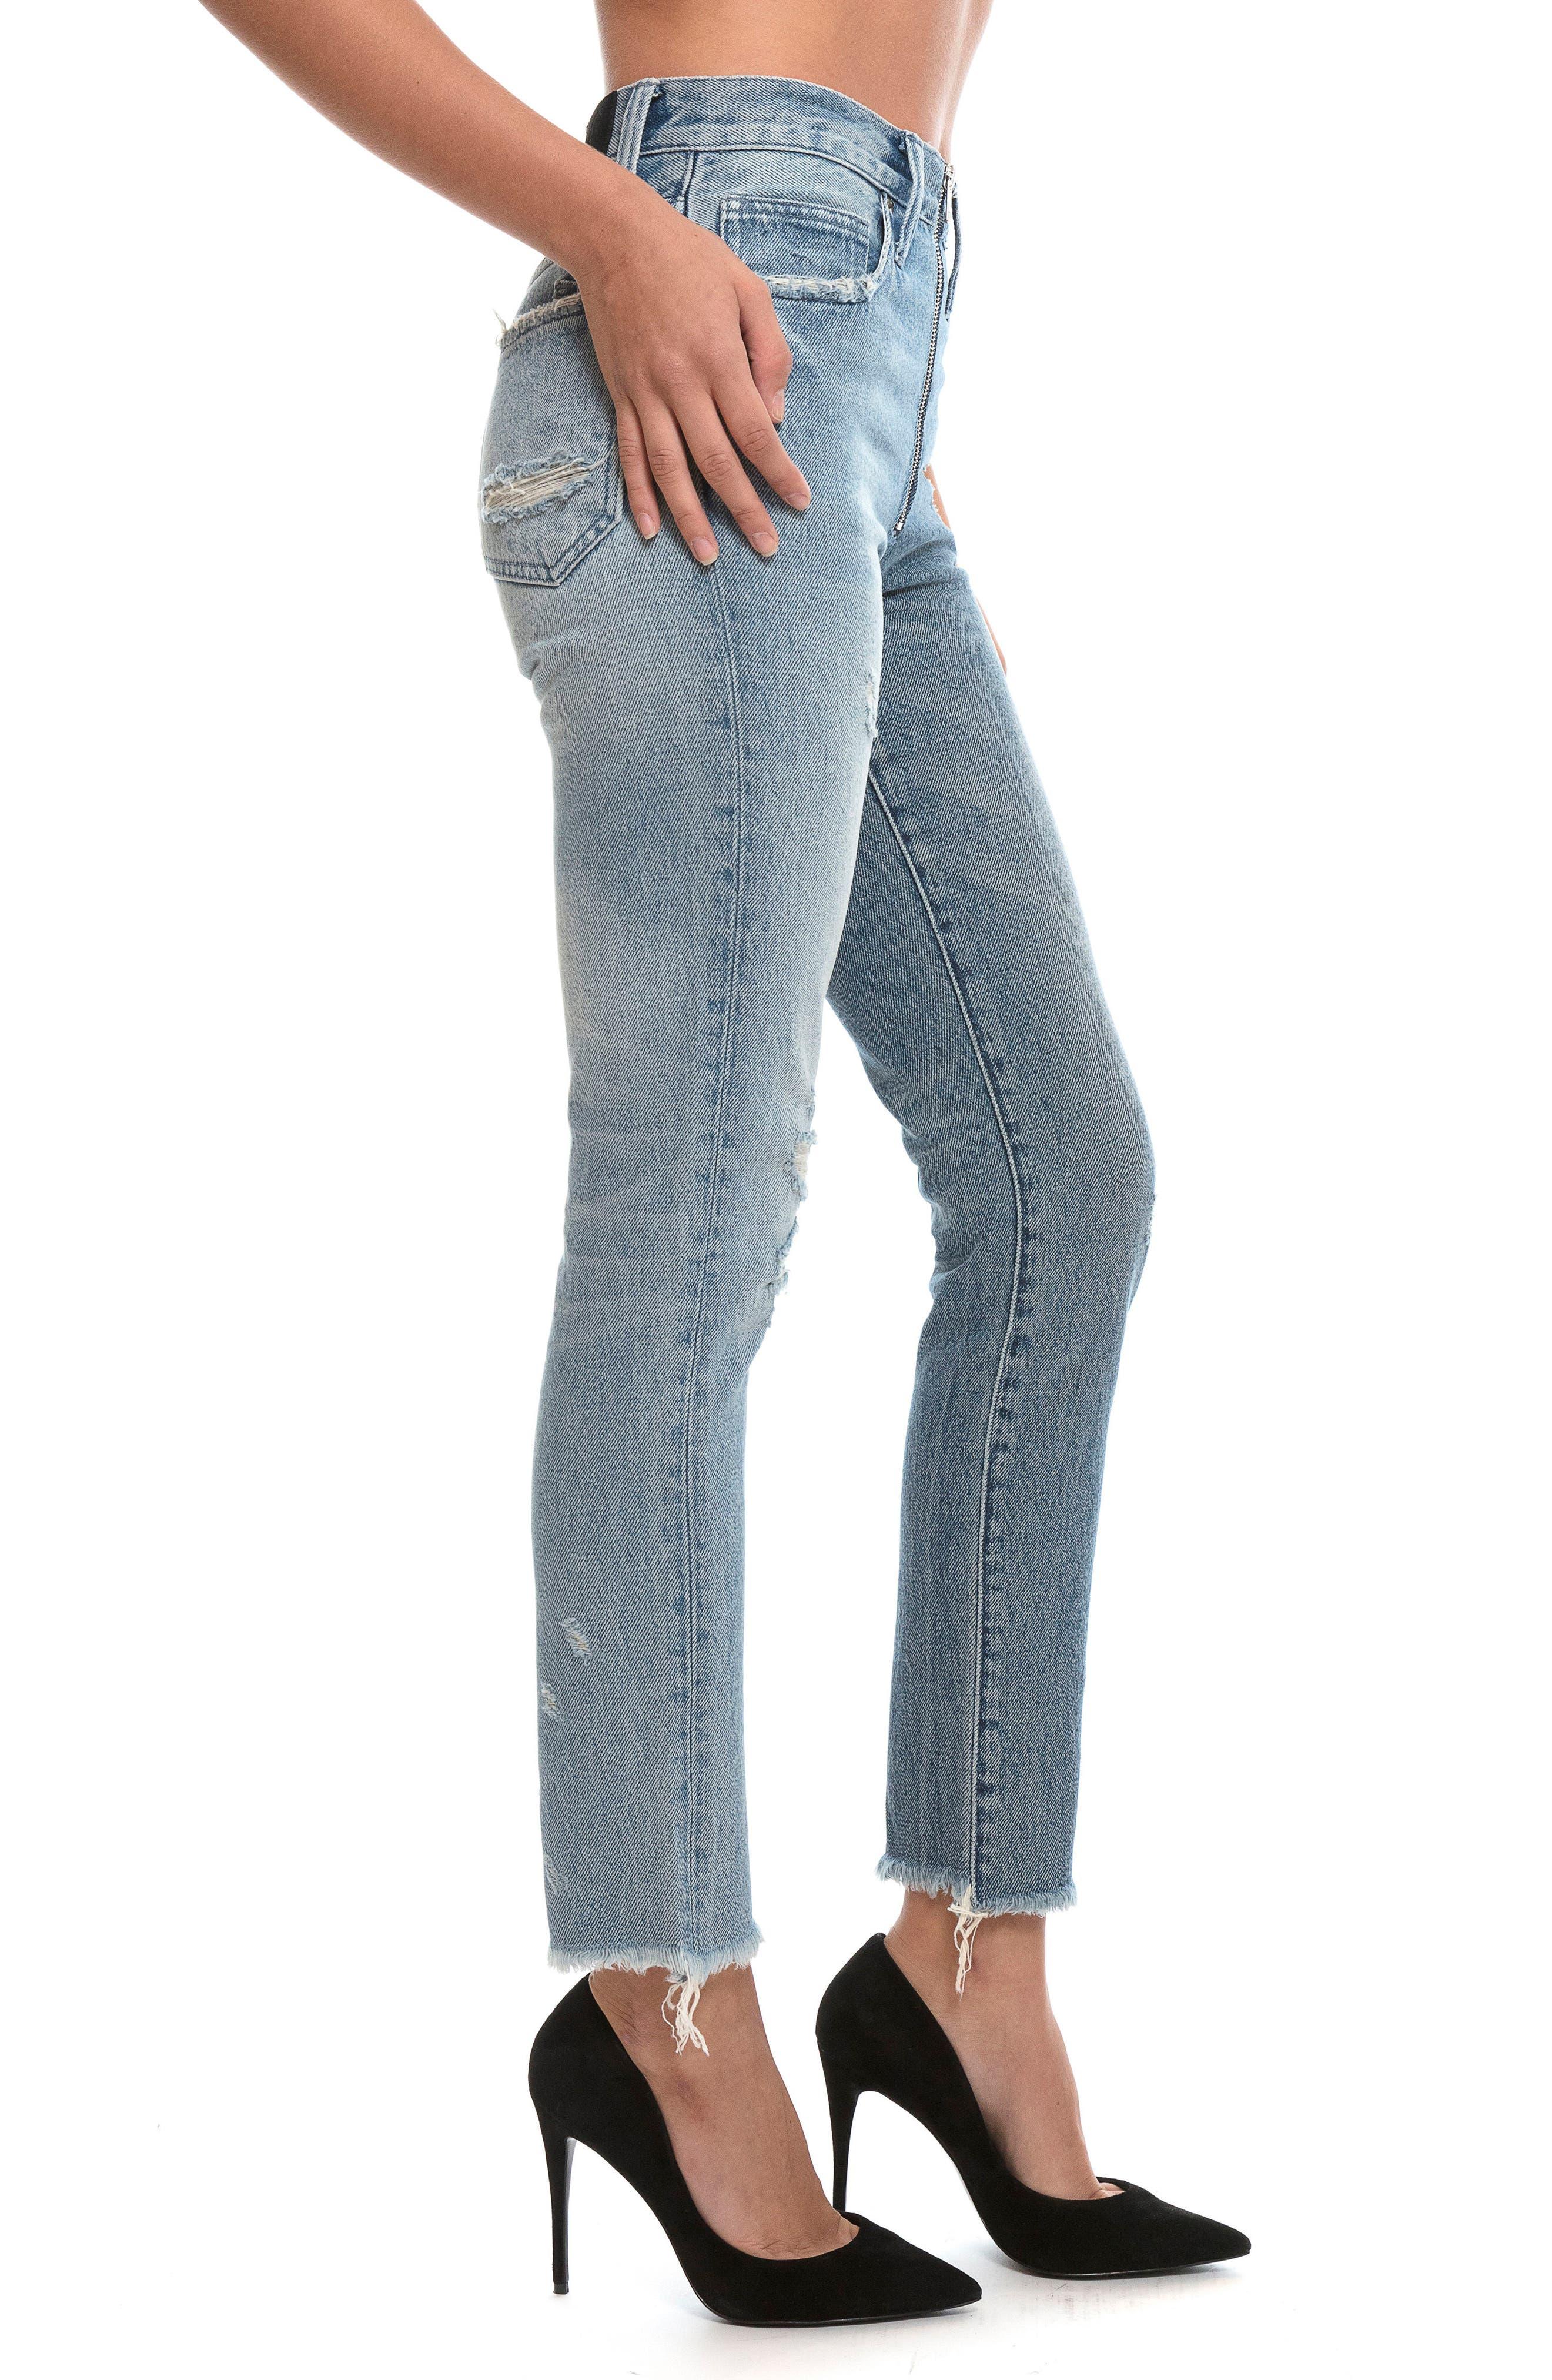 Chevelle Ankle Skinny Jeans,                             Alternate thumbnail 3, color,                             Indigo